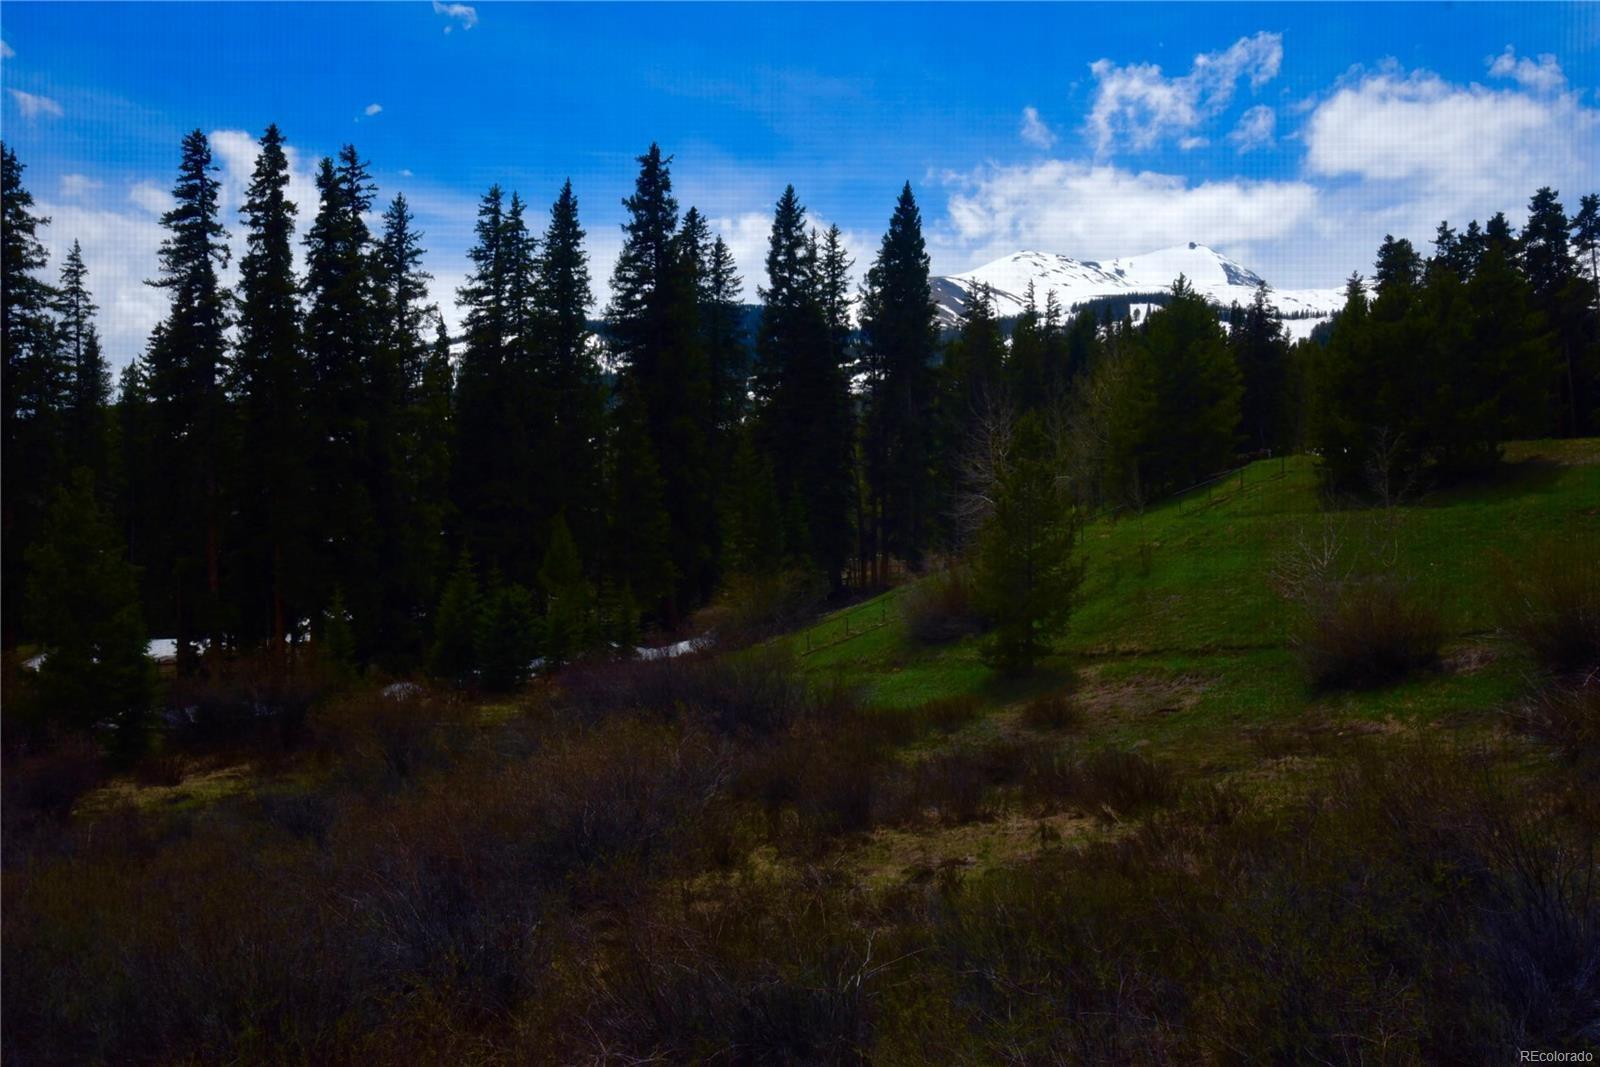 MLS# 3383950 - 17 - 73 Tall Pines Drive, Breckenridge, CO 80424